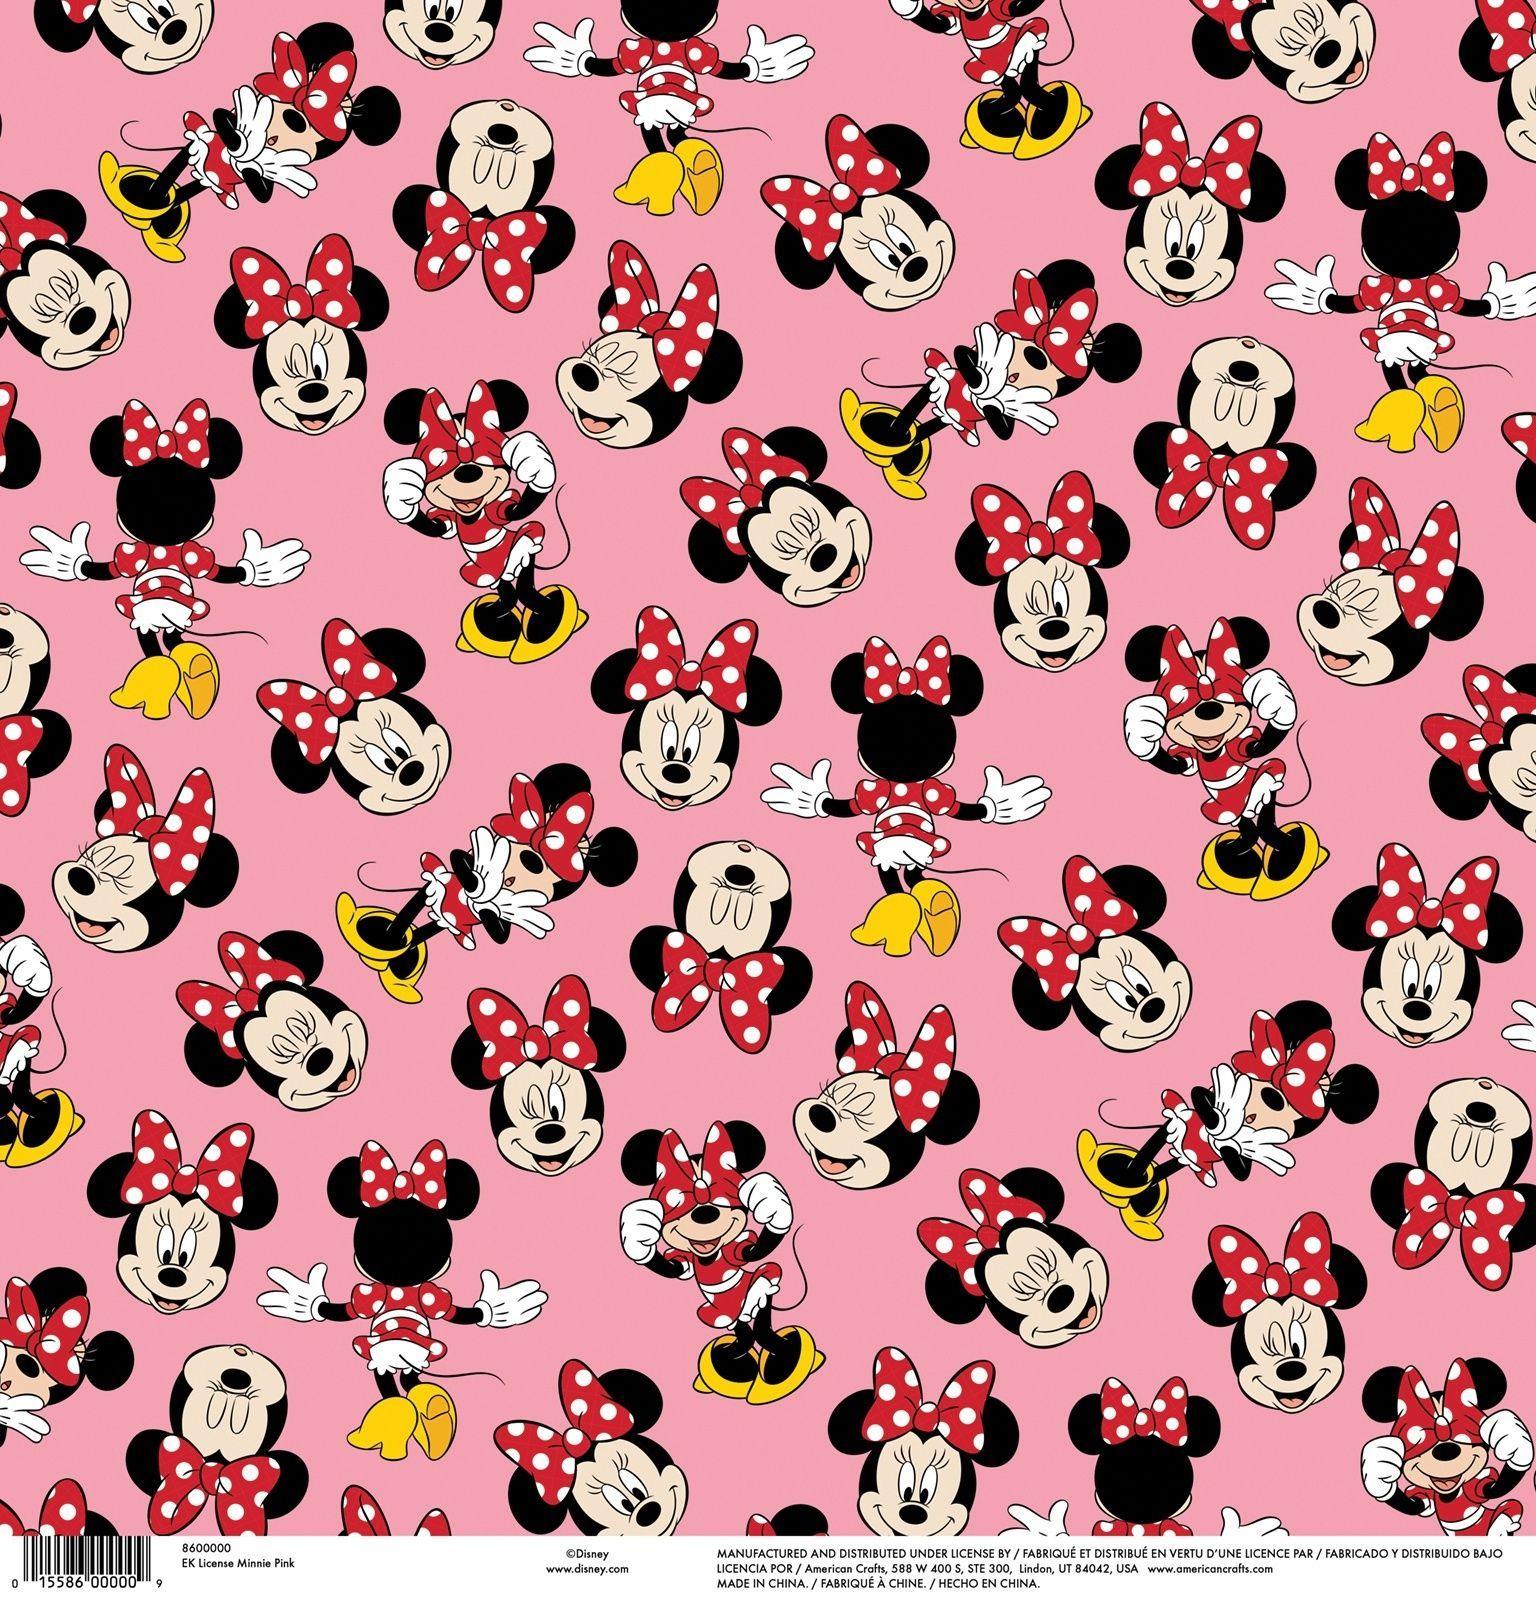 Ek Success Ek Disney Single Sided Cardstock 12 X12 Minnie Pink Mickey Mouse Wallpaper Minnie Mouse Background Cute Disney Wallpaper